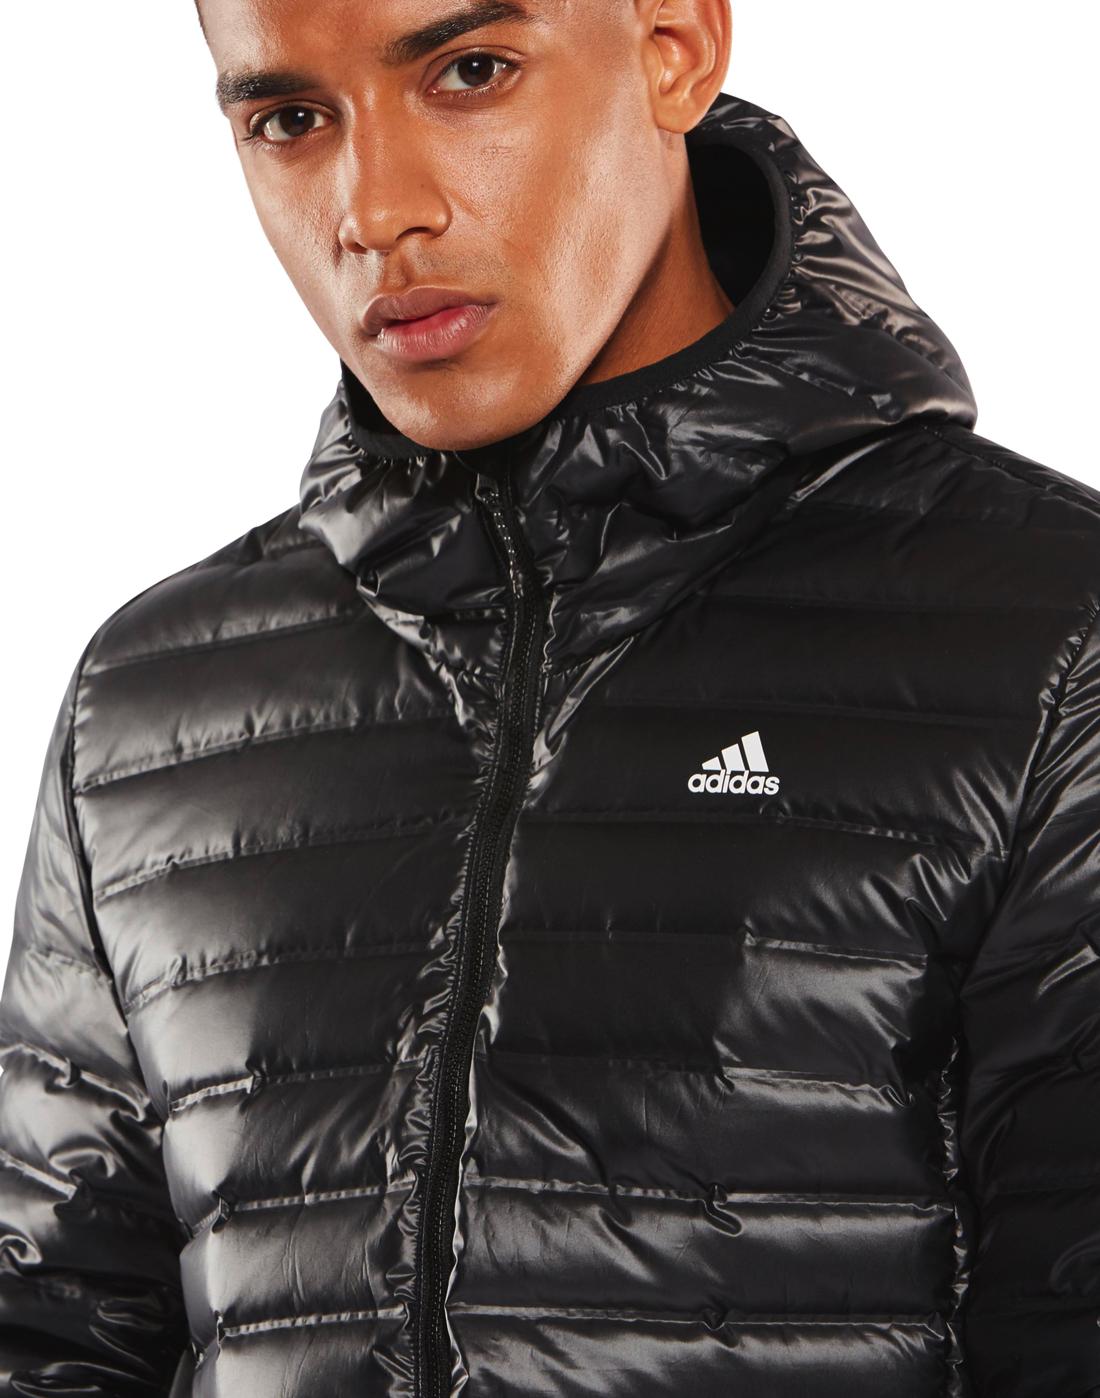 9ecee35ac2d0 Men s Black adidas Varilite Jacket